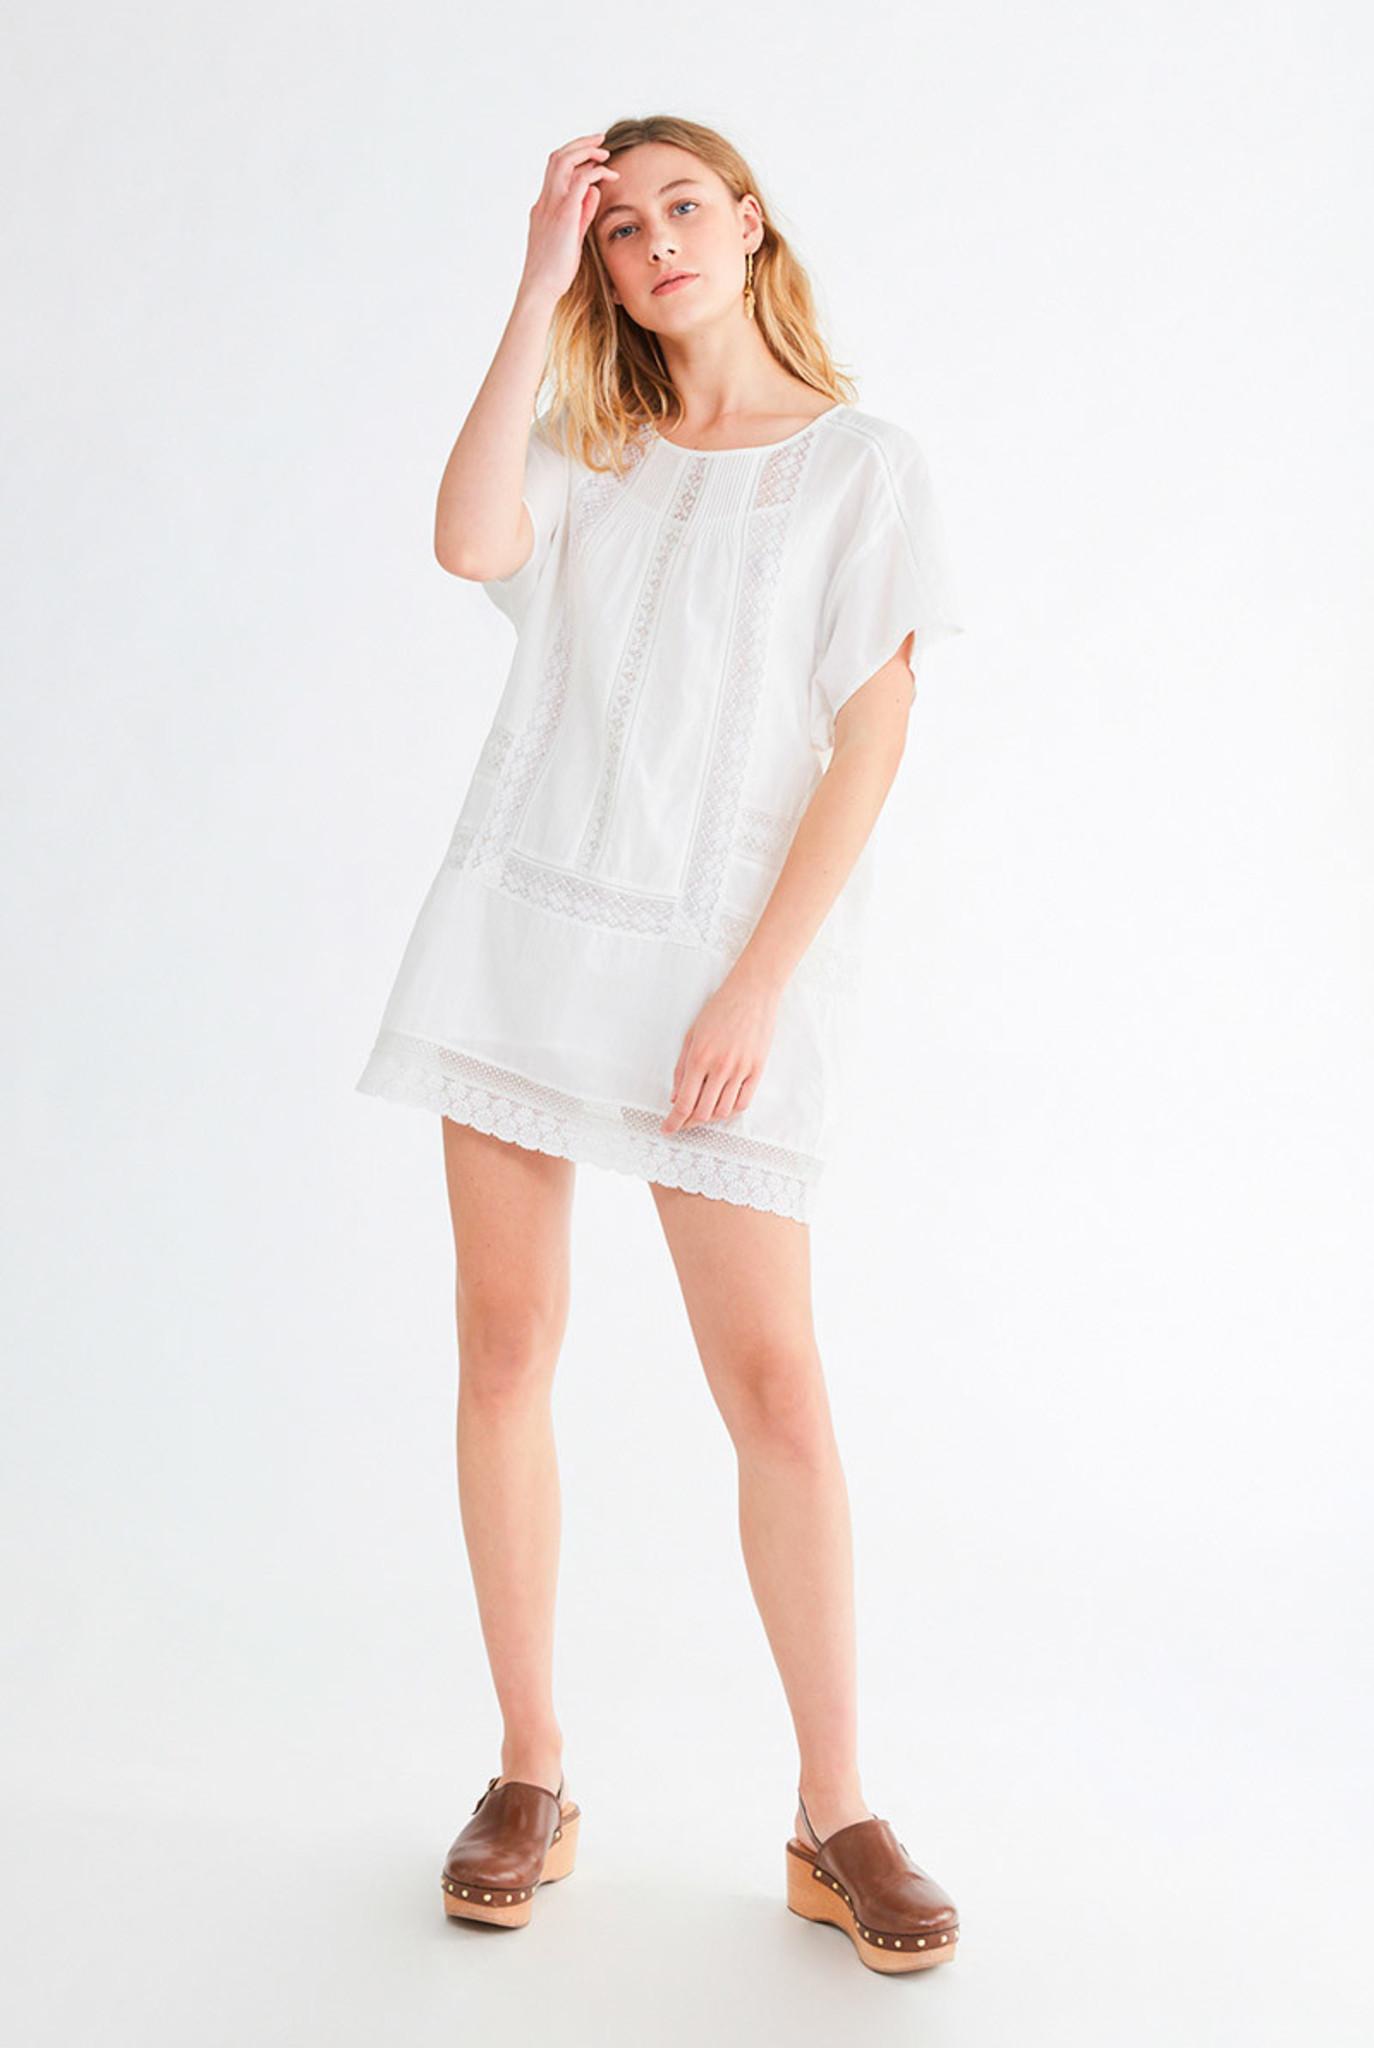 Nirvana dress Ivory